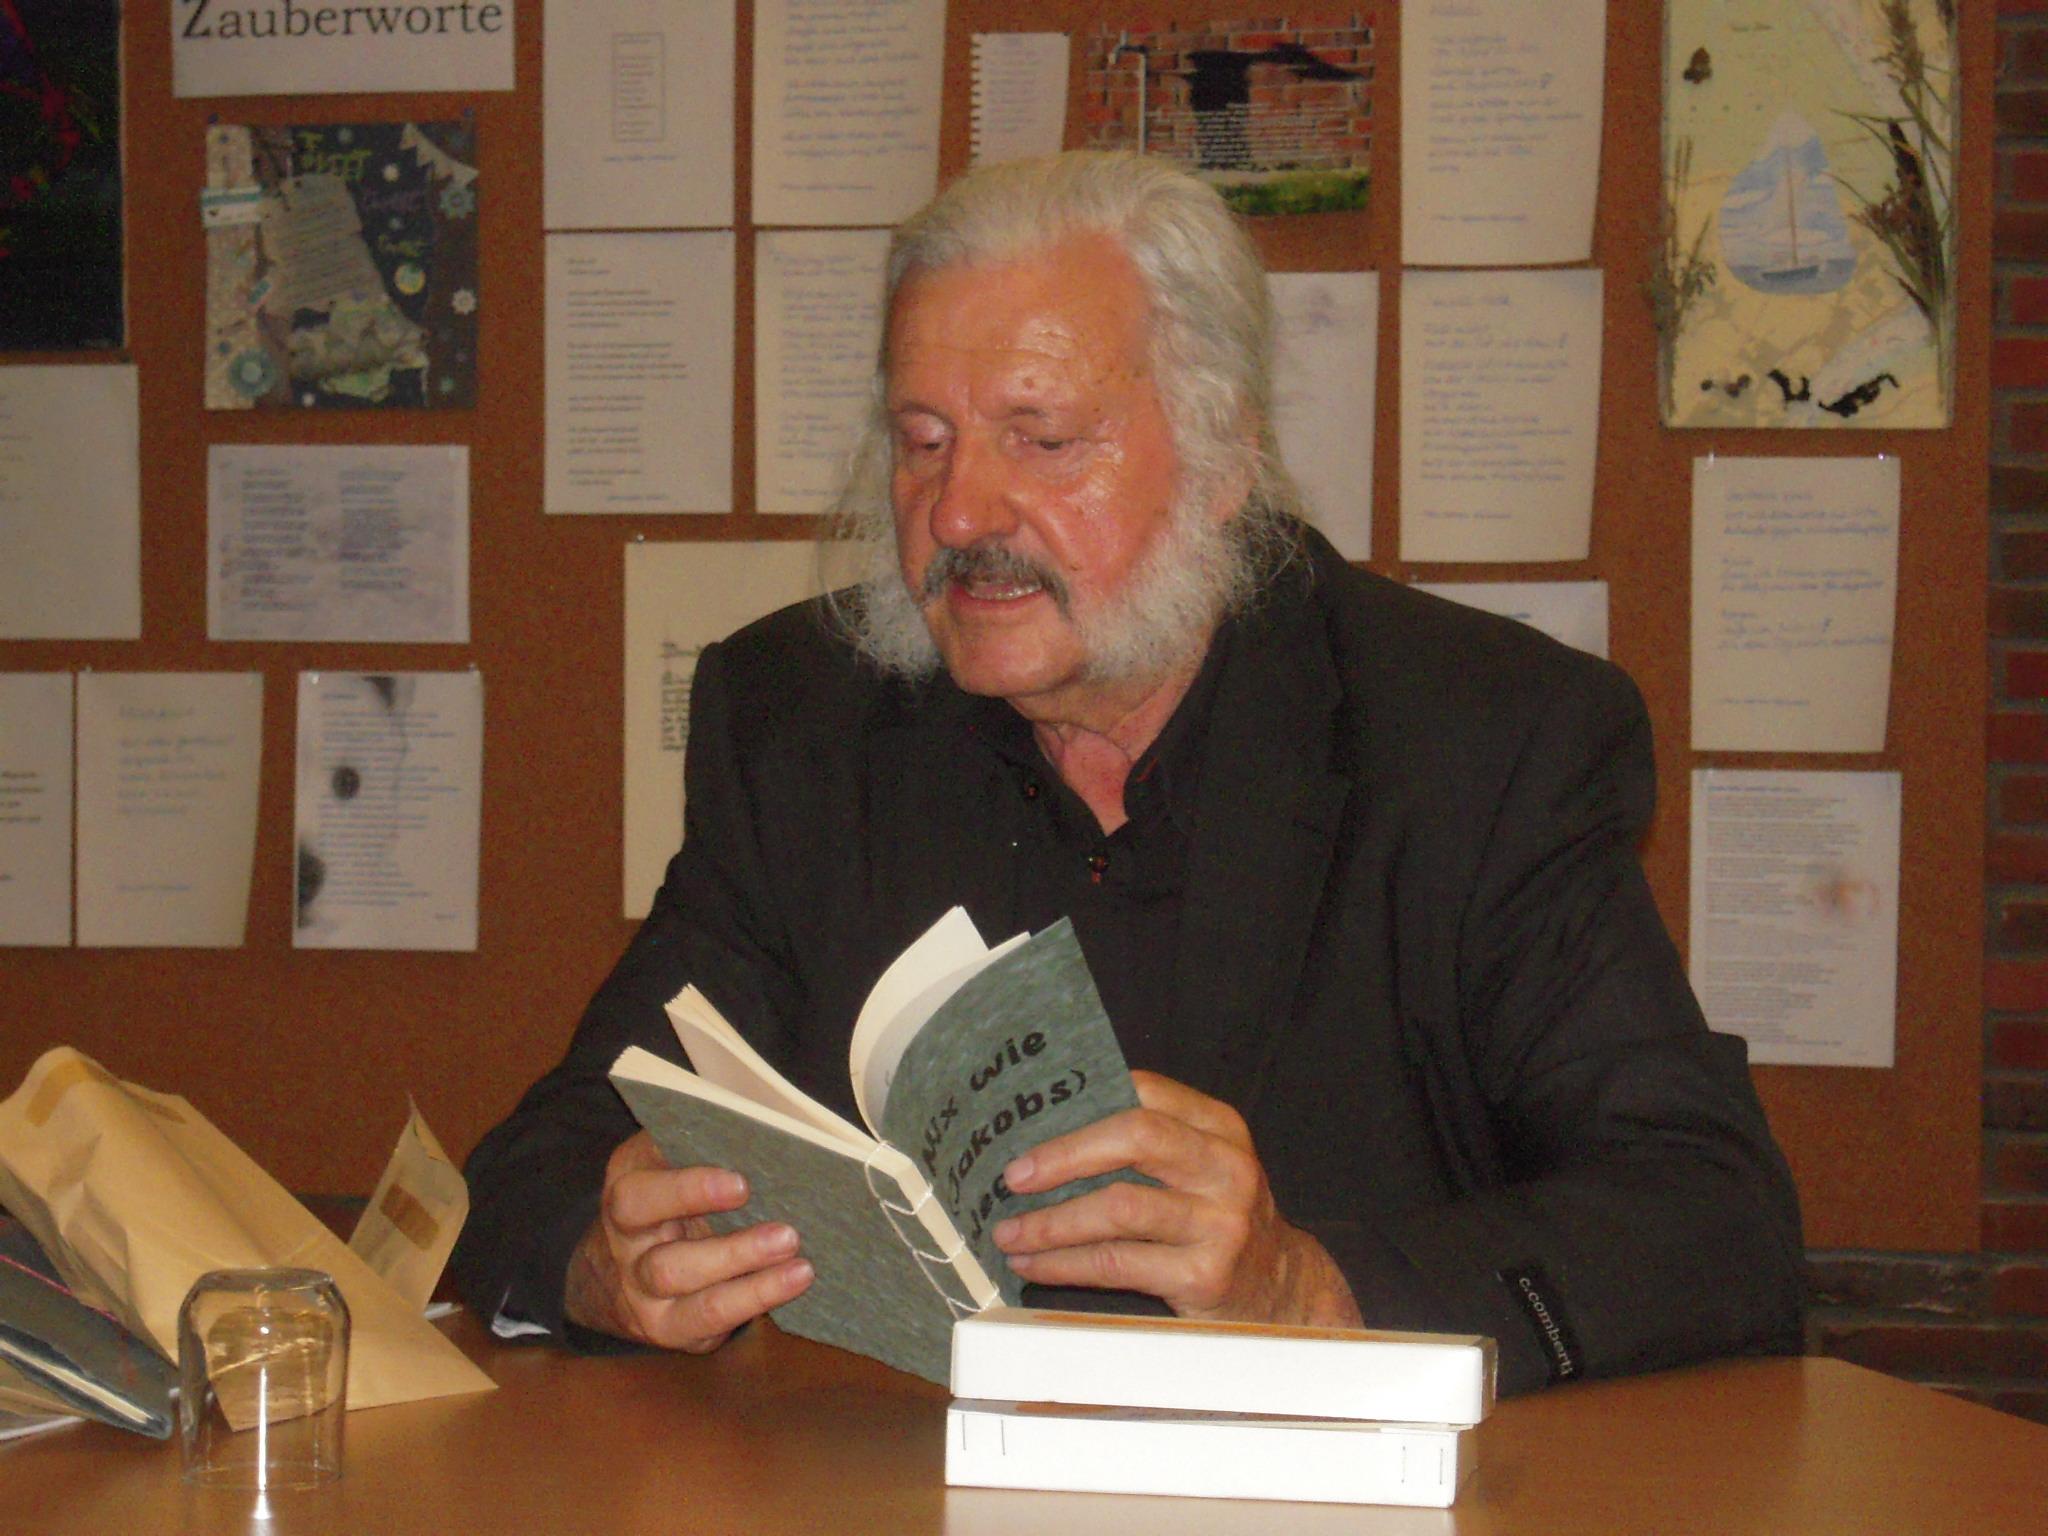 Ingo Cesaro